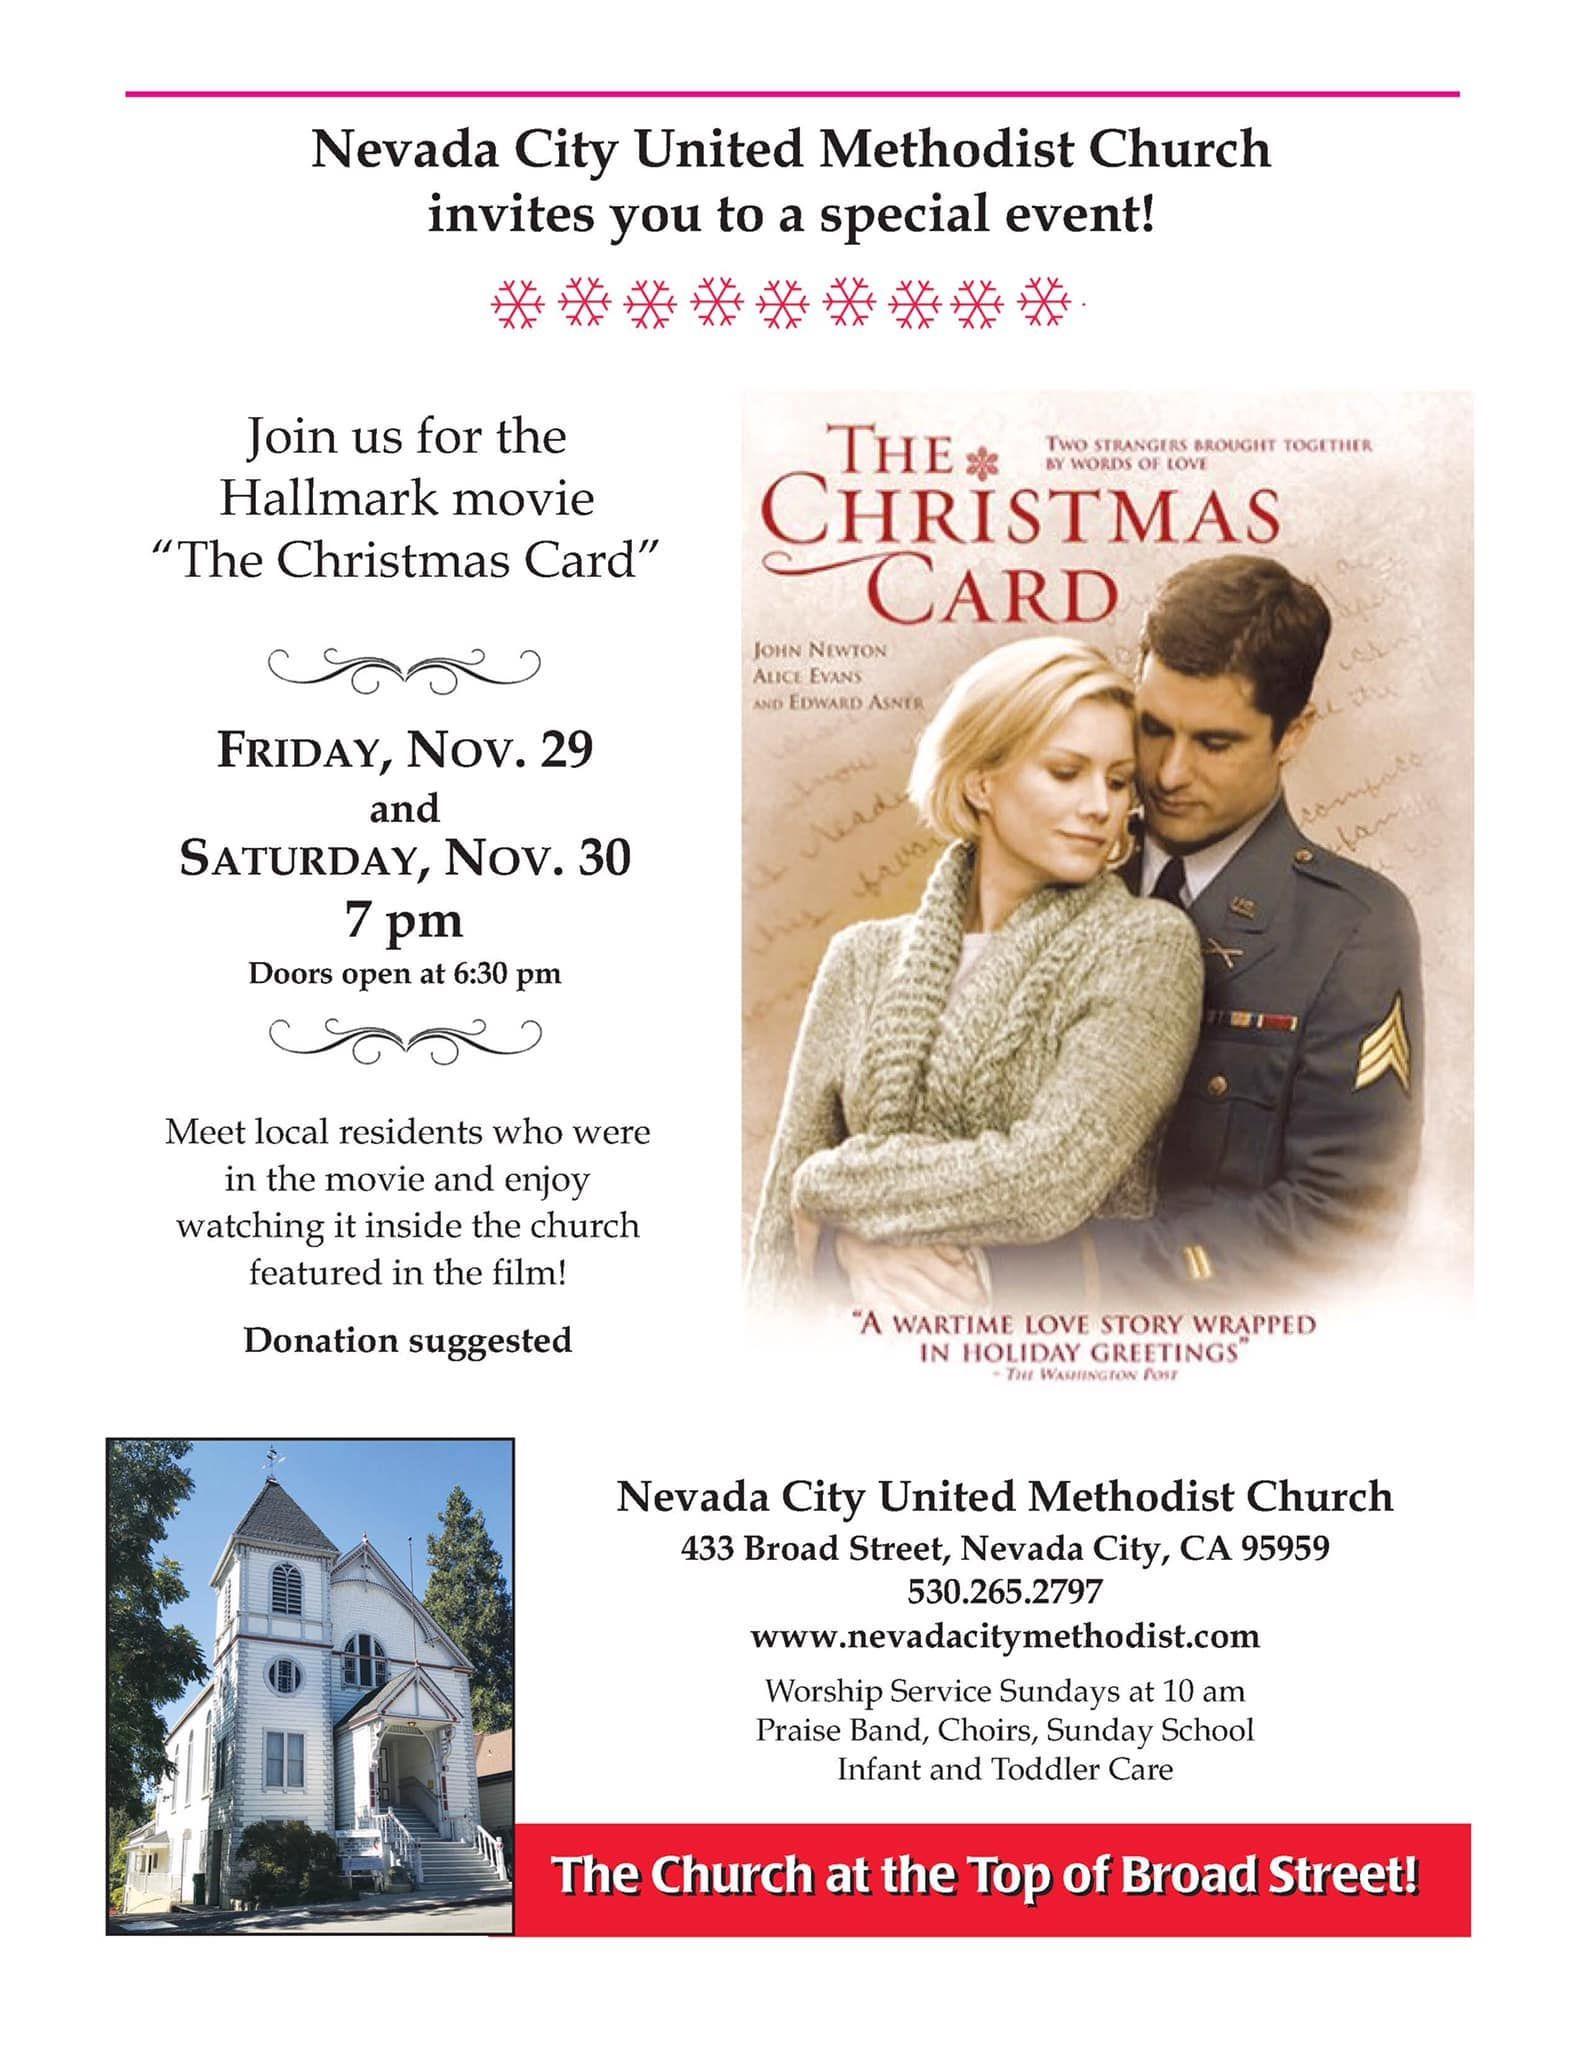 Nevada City Christmas 2020 Nevada City Methodist Craft Fair The Christmas Card   The christmas card movie, Nevada city